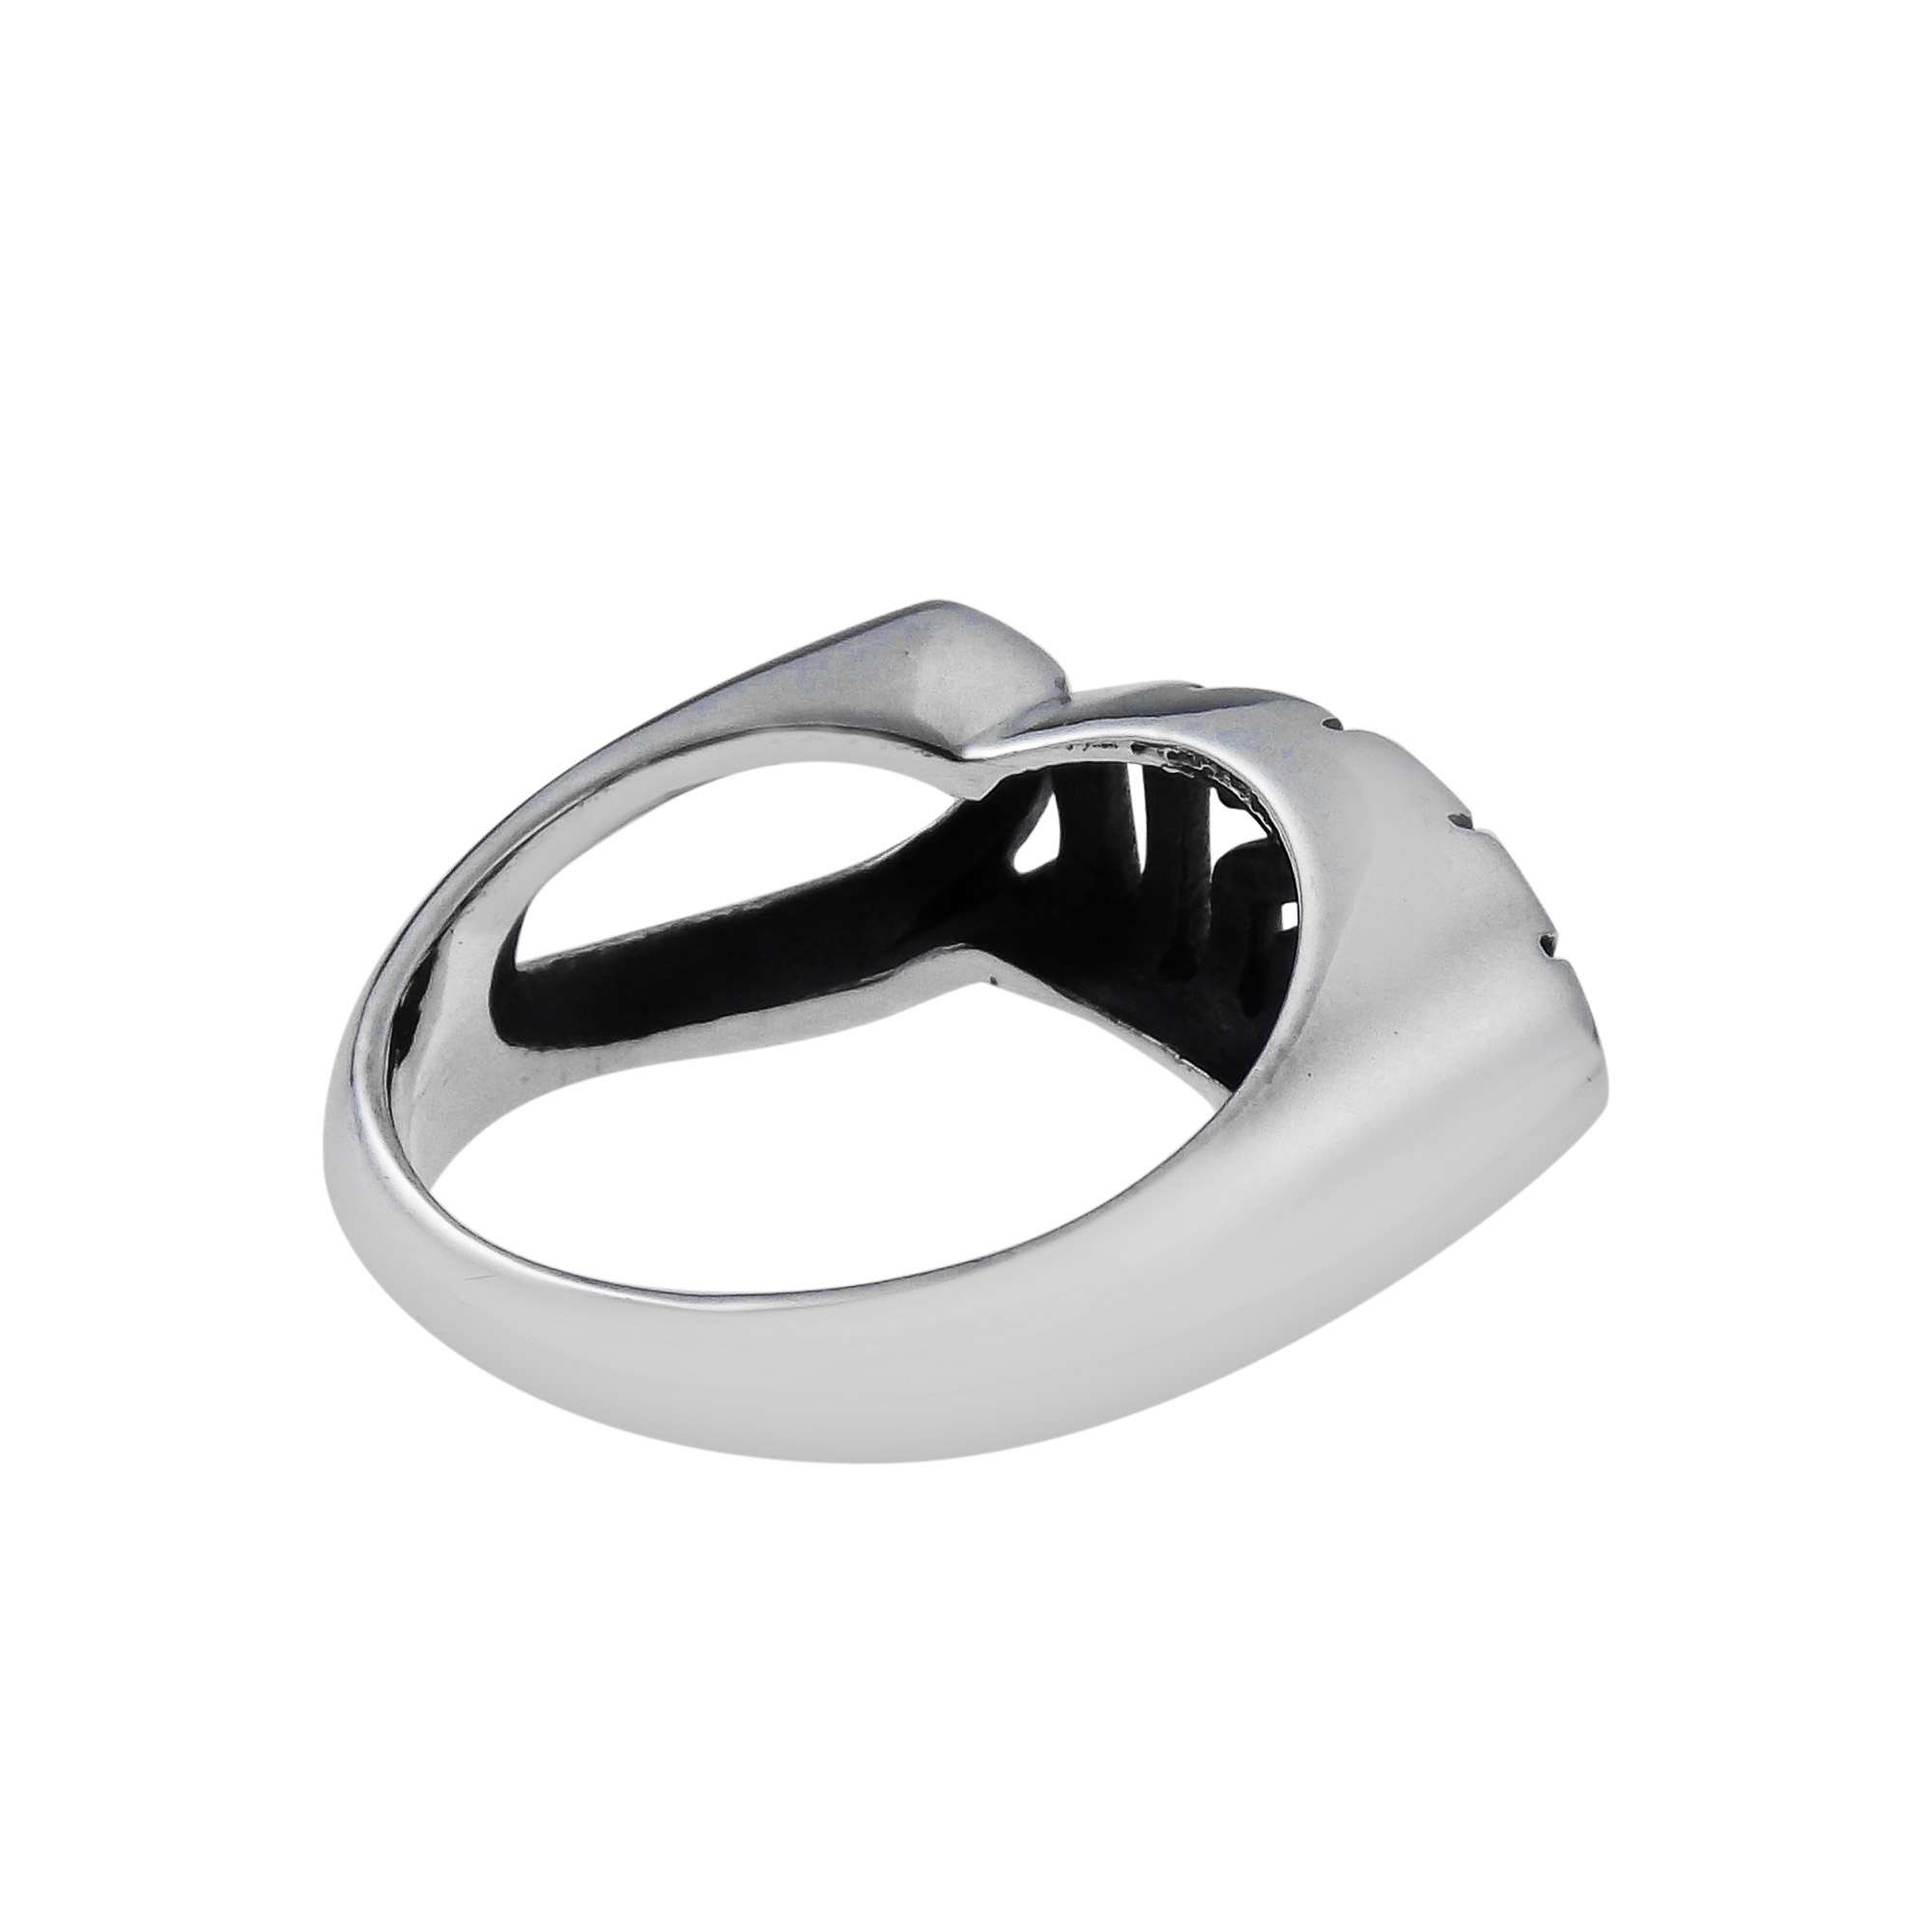 jesus fish ichthys christian symbol 925 silver ring 6